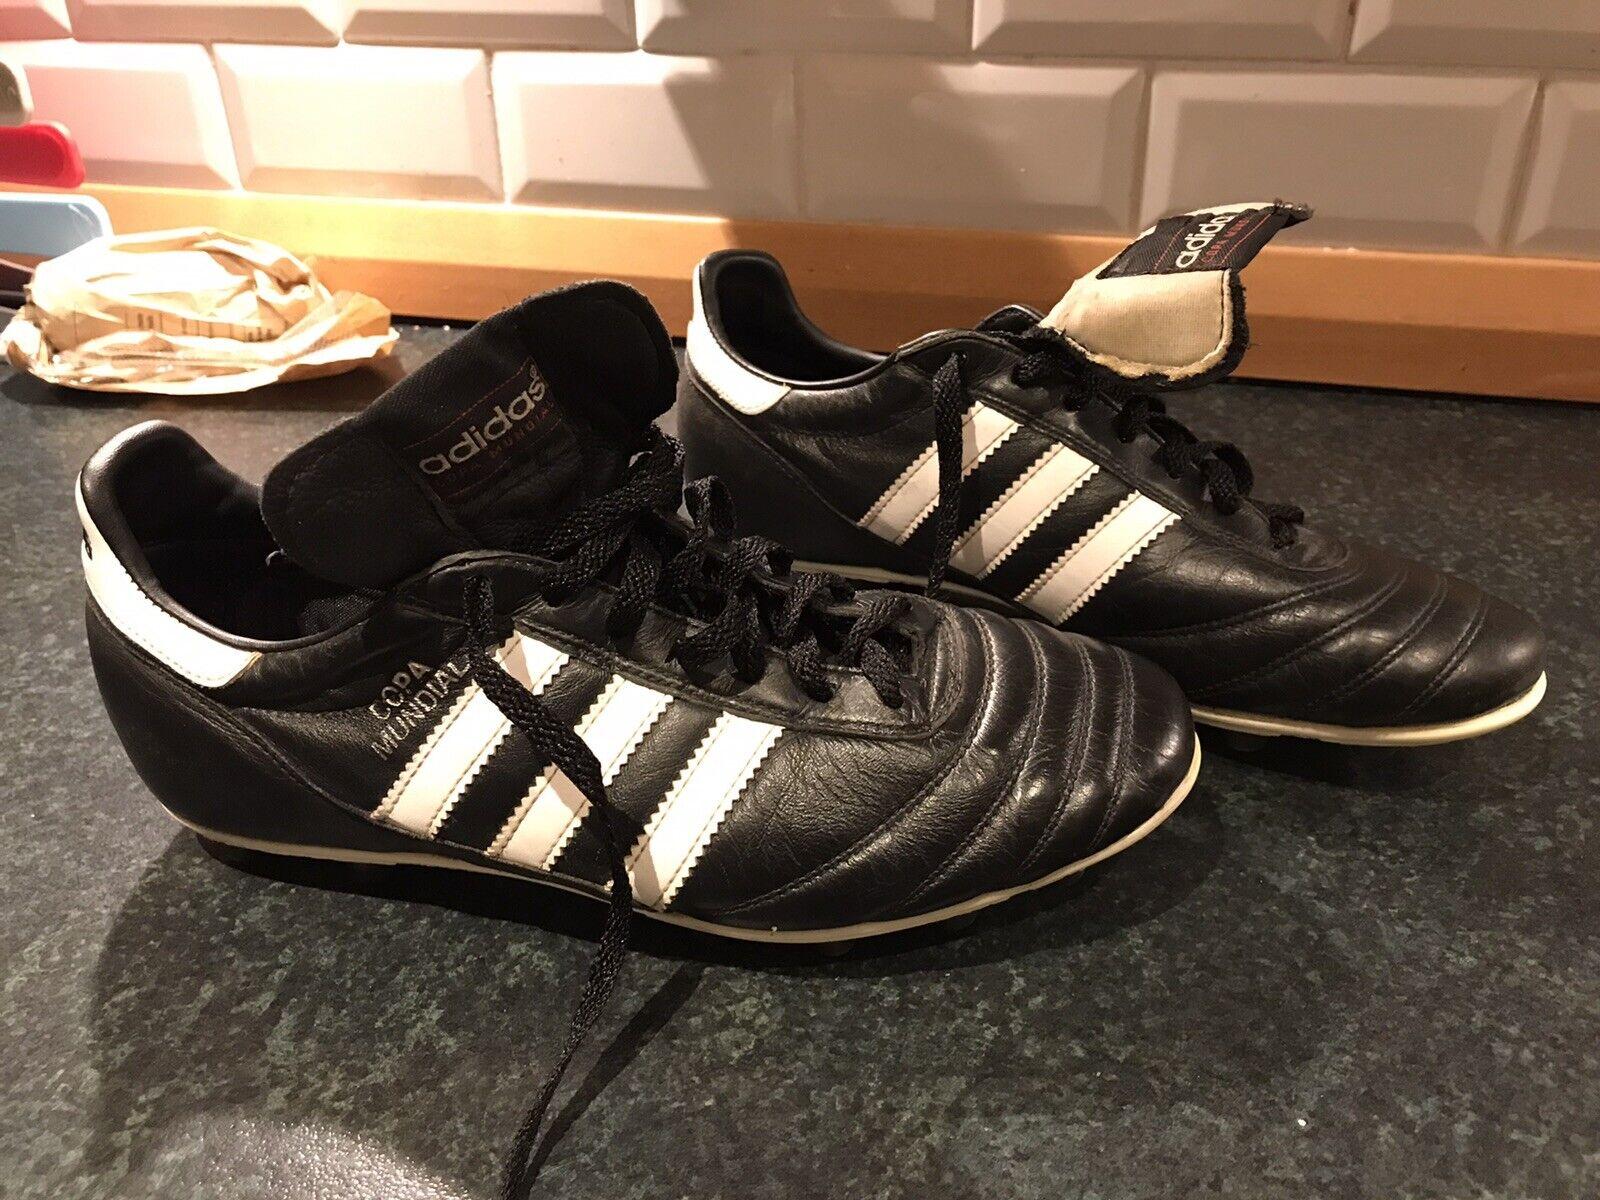 Adidas Copa Mundial Football Stiefel Uk Größe 7